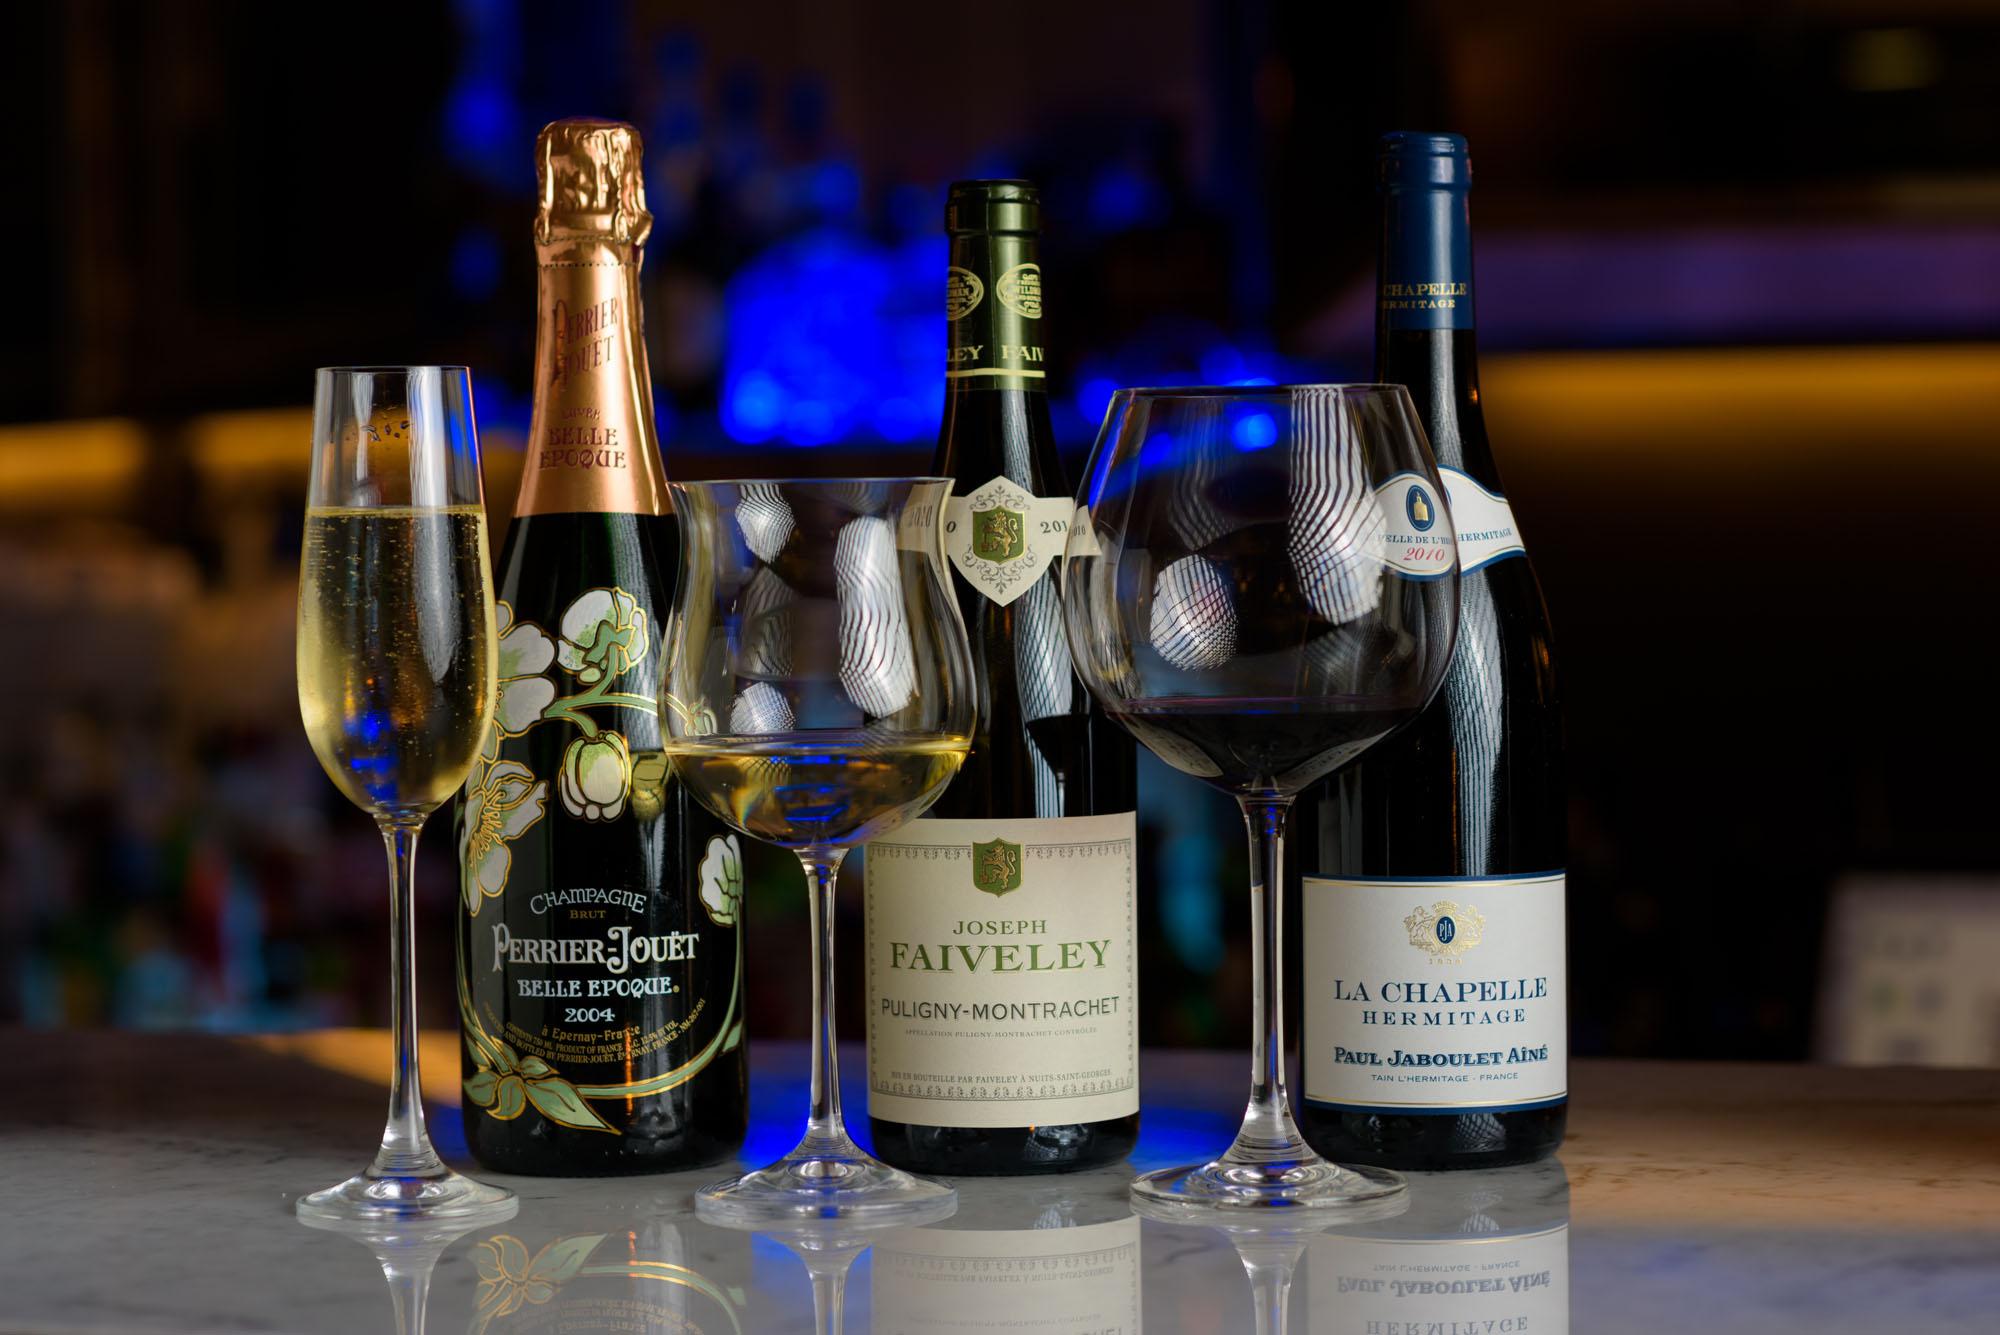 8491_d810a_Bon_Vivant_Palo_Alto_Restaurant_Food_Drink_Photography.jpg